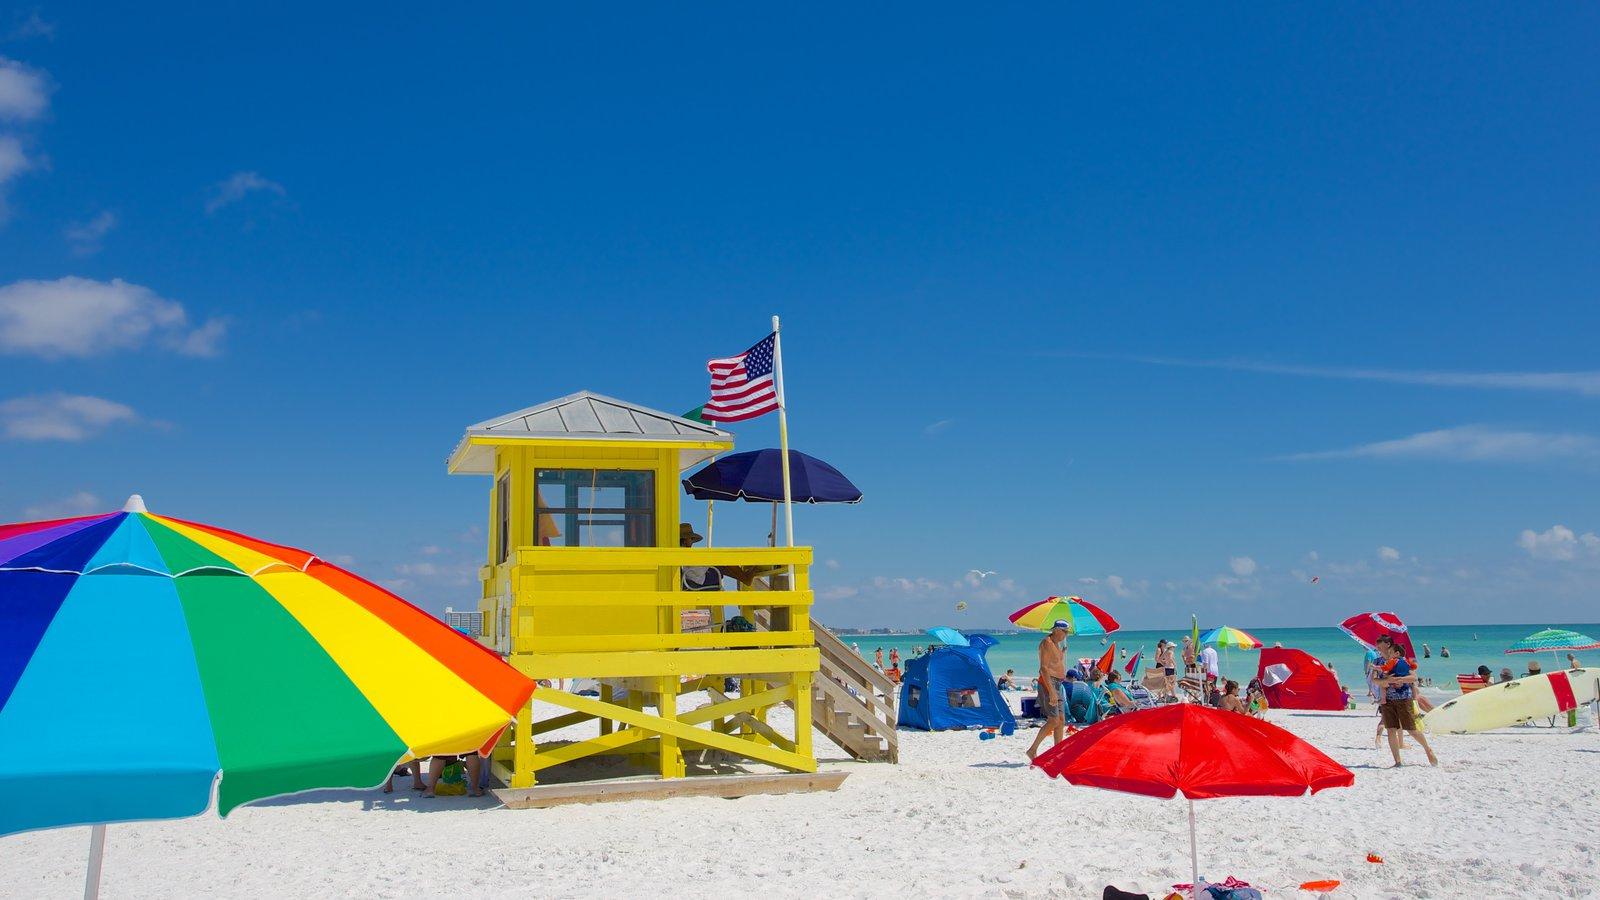 Siesta Key Public Beach mostrando uma praia